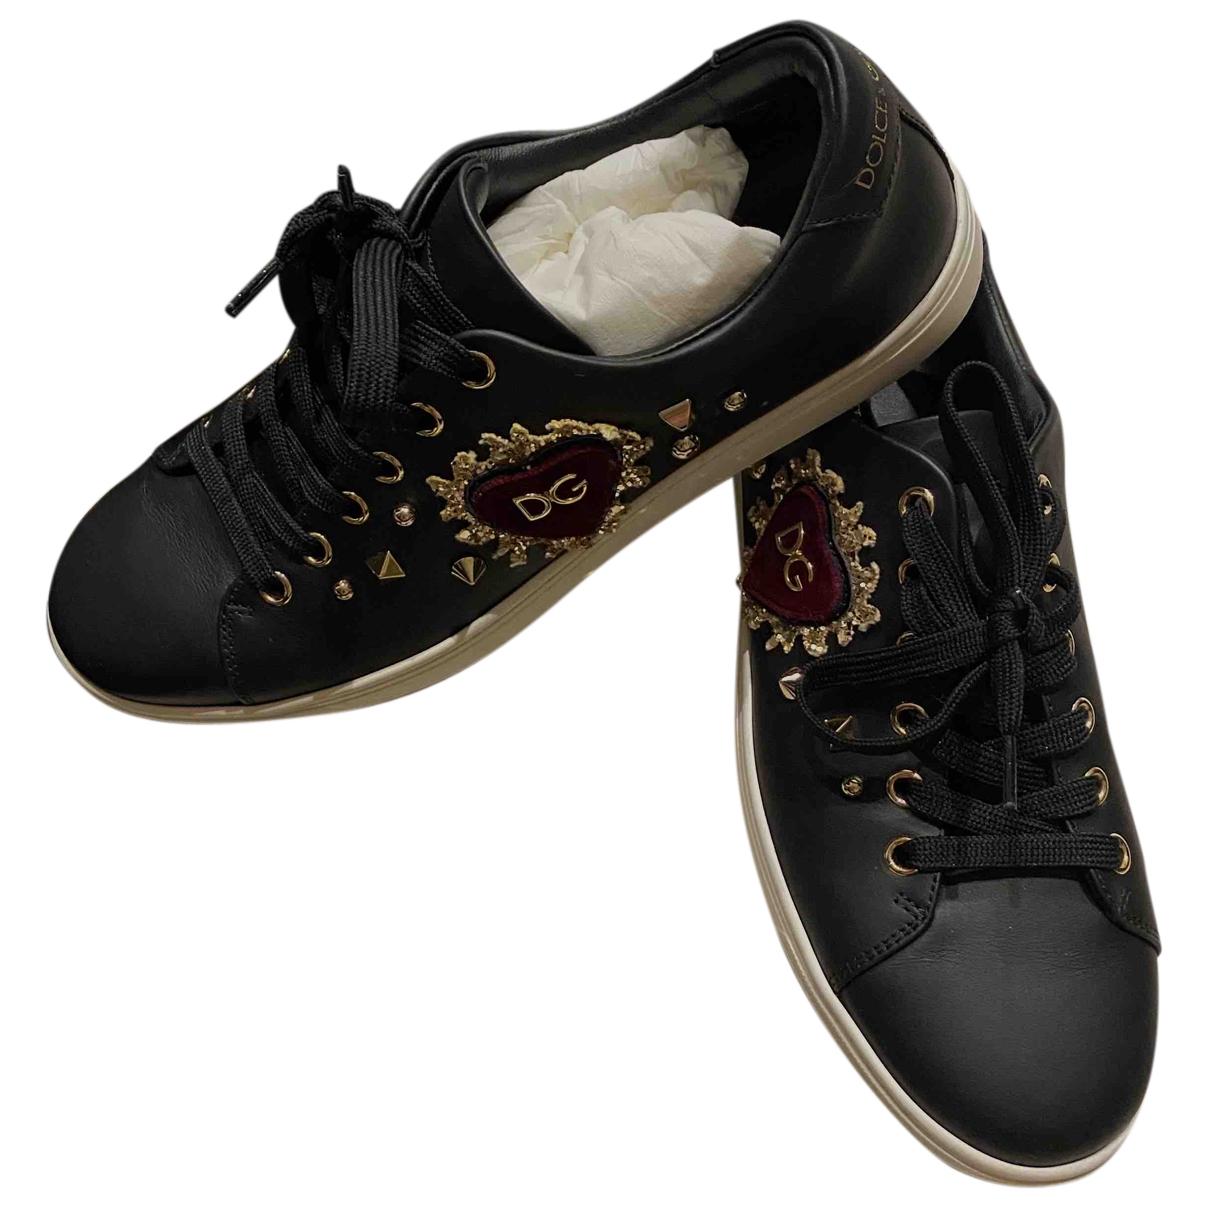 Dolce & Gabbana N Black Leather Trainers for Women 38 EU